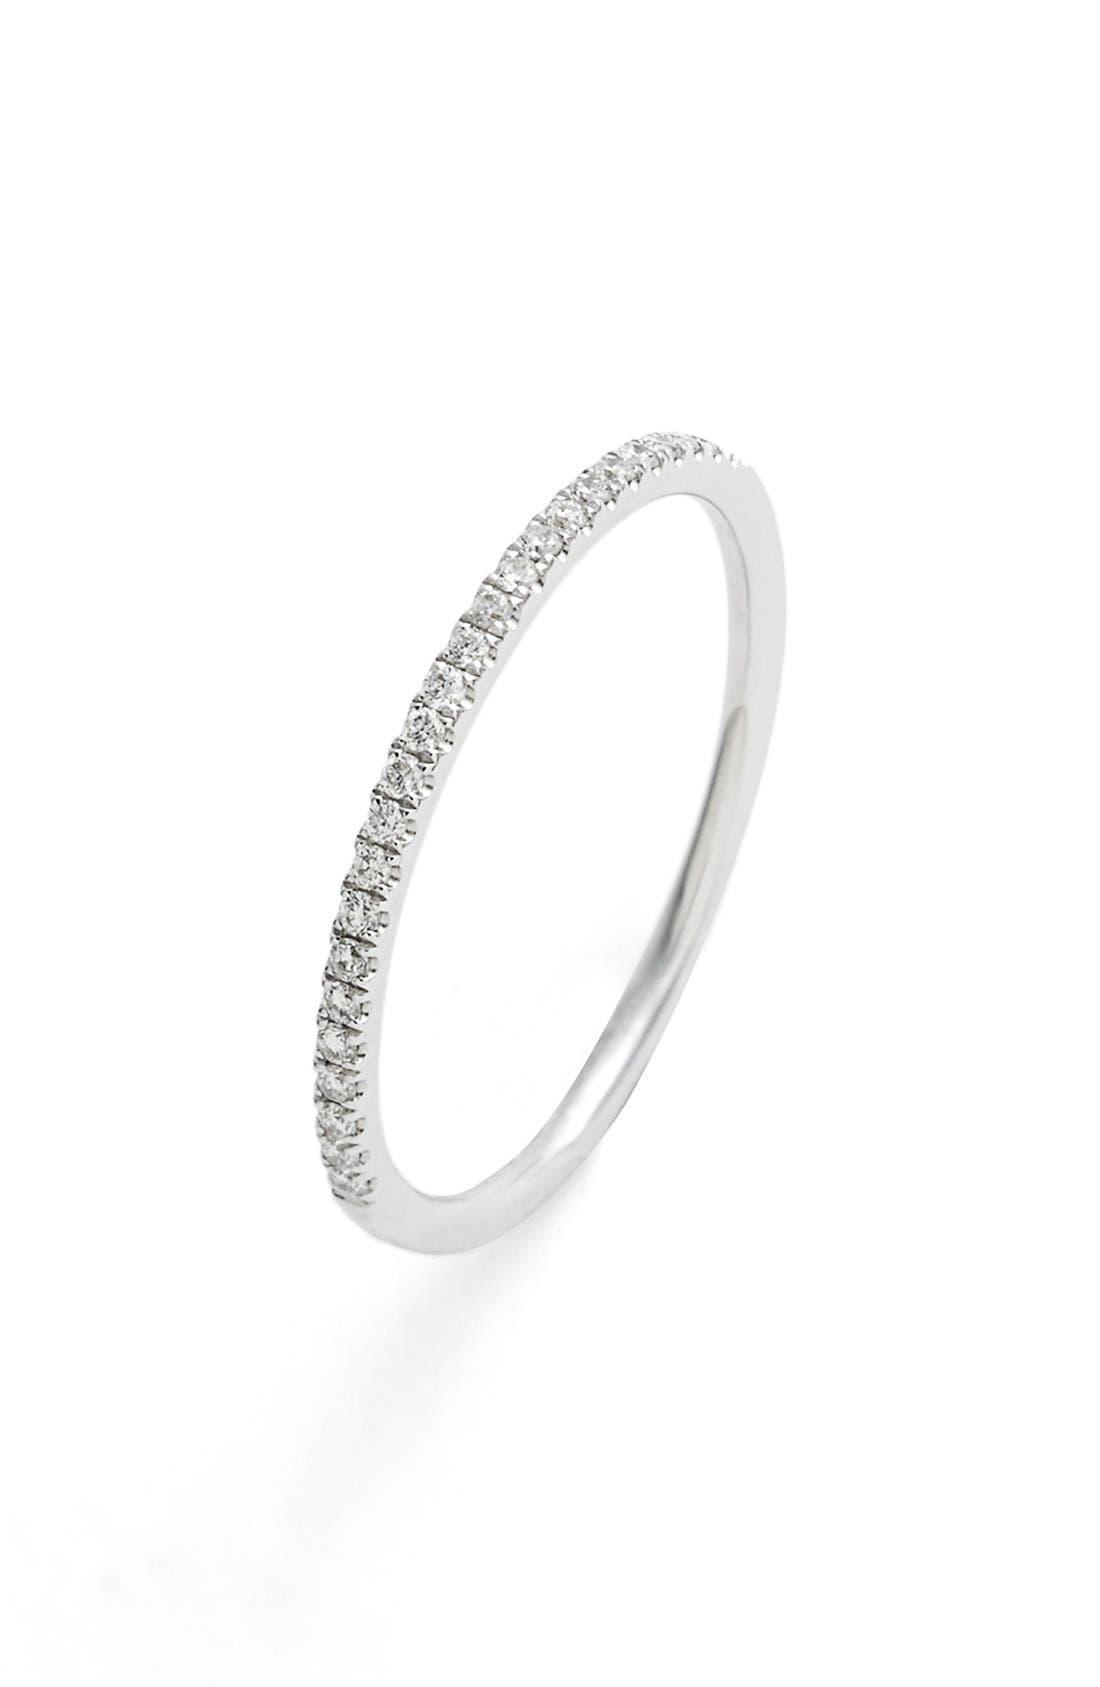 ae32bd8e4f39 Rings Accessories